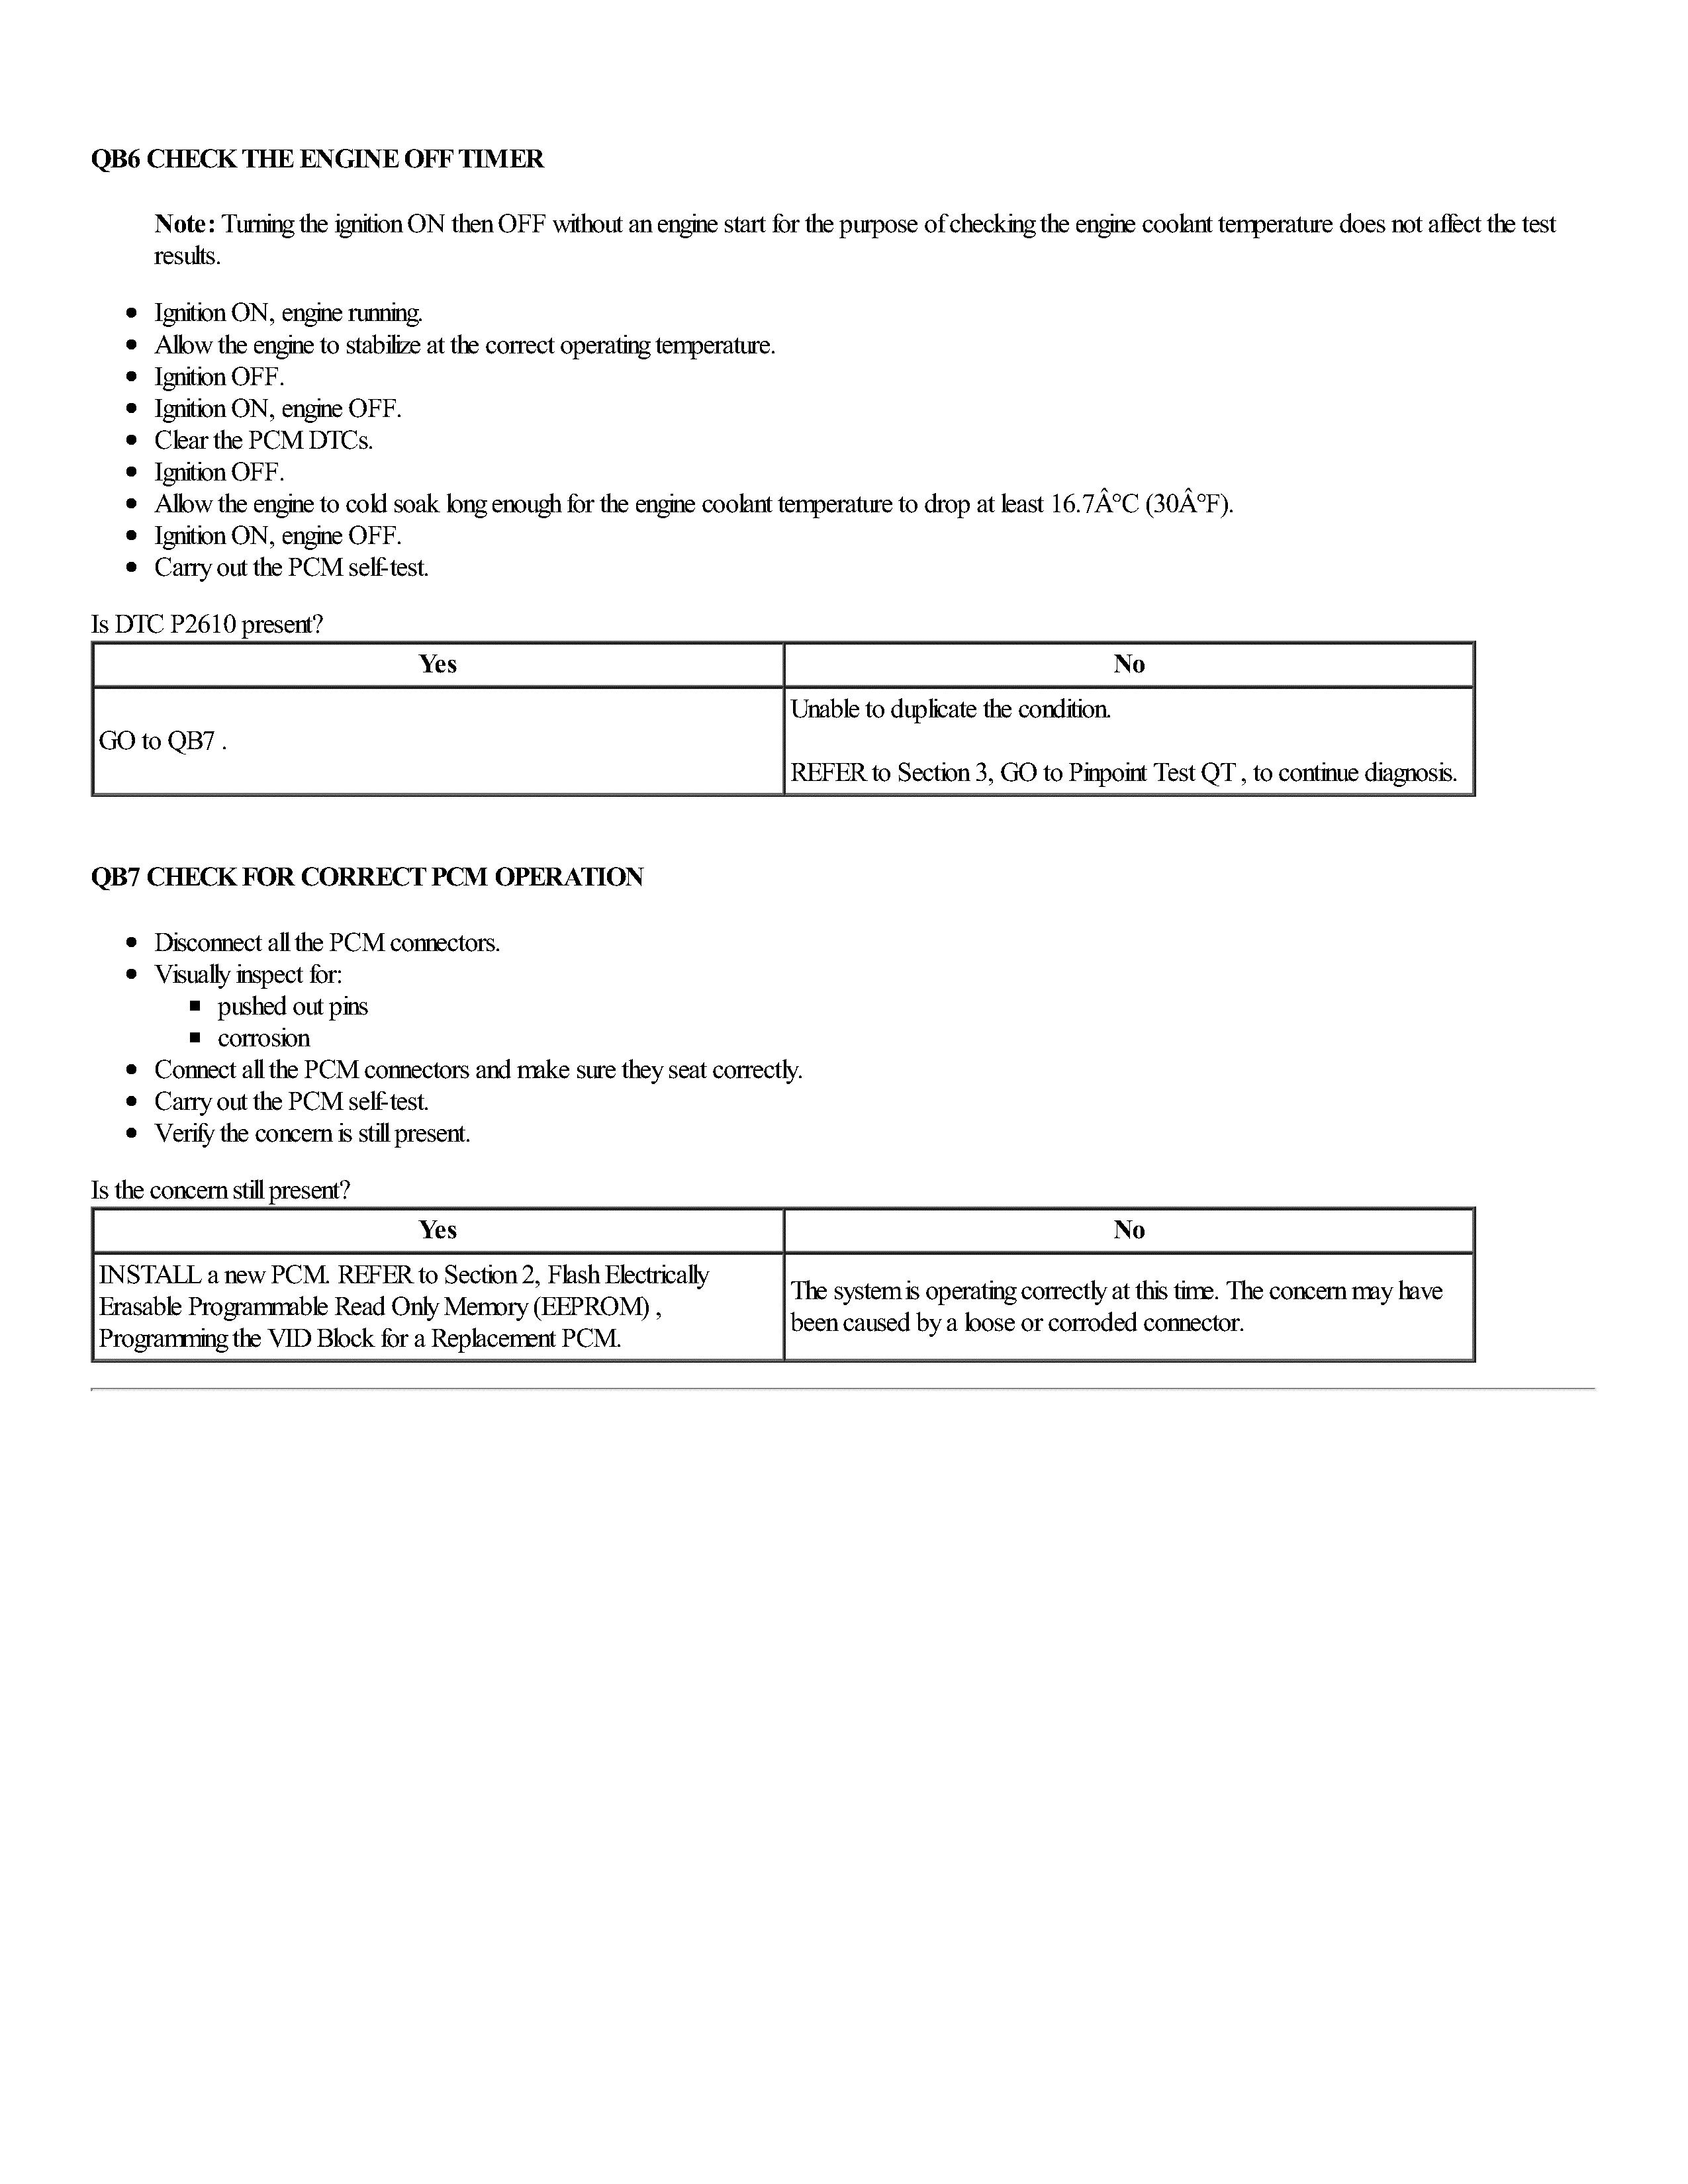 pinpoint-test-qb-3